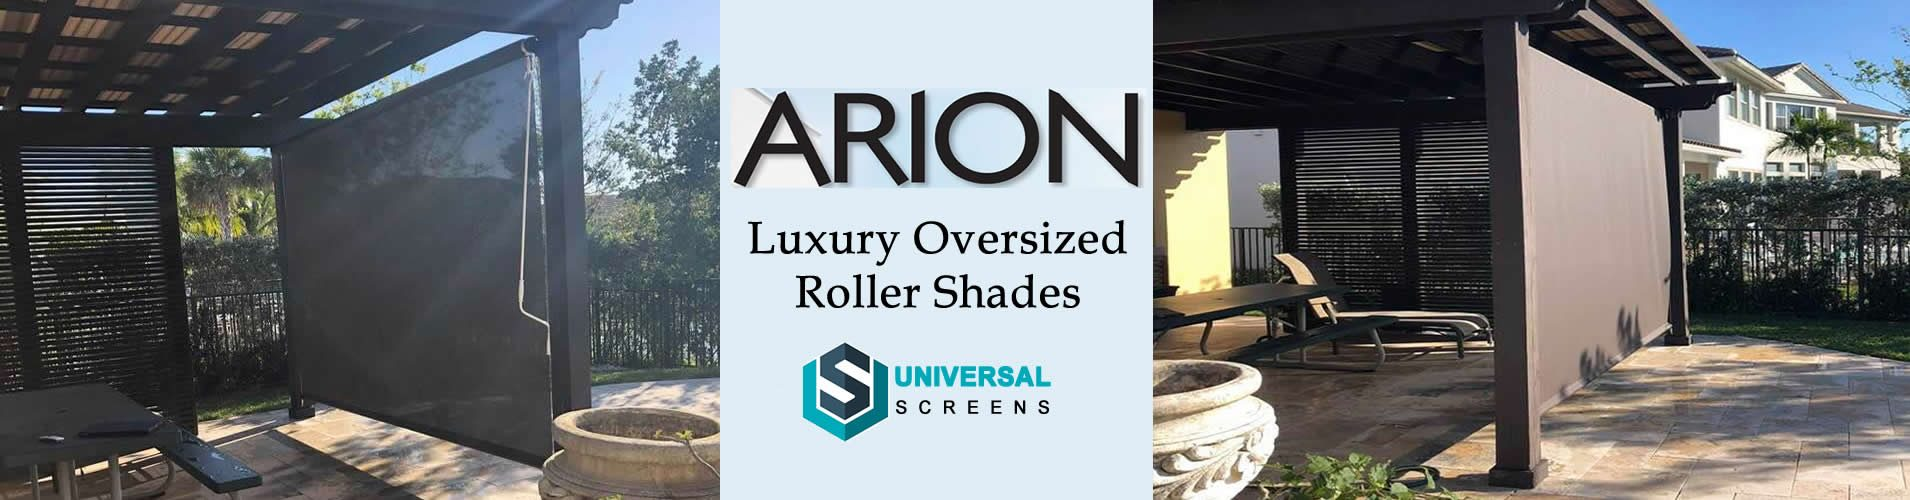 crank operated manual porch shades Houston TX